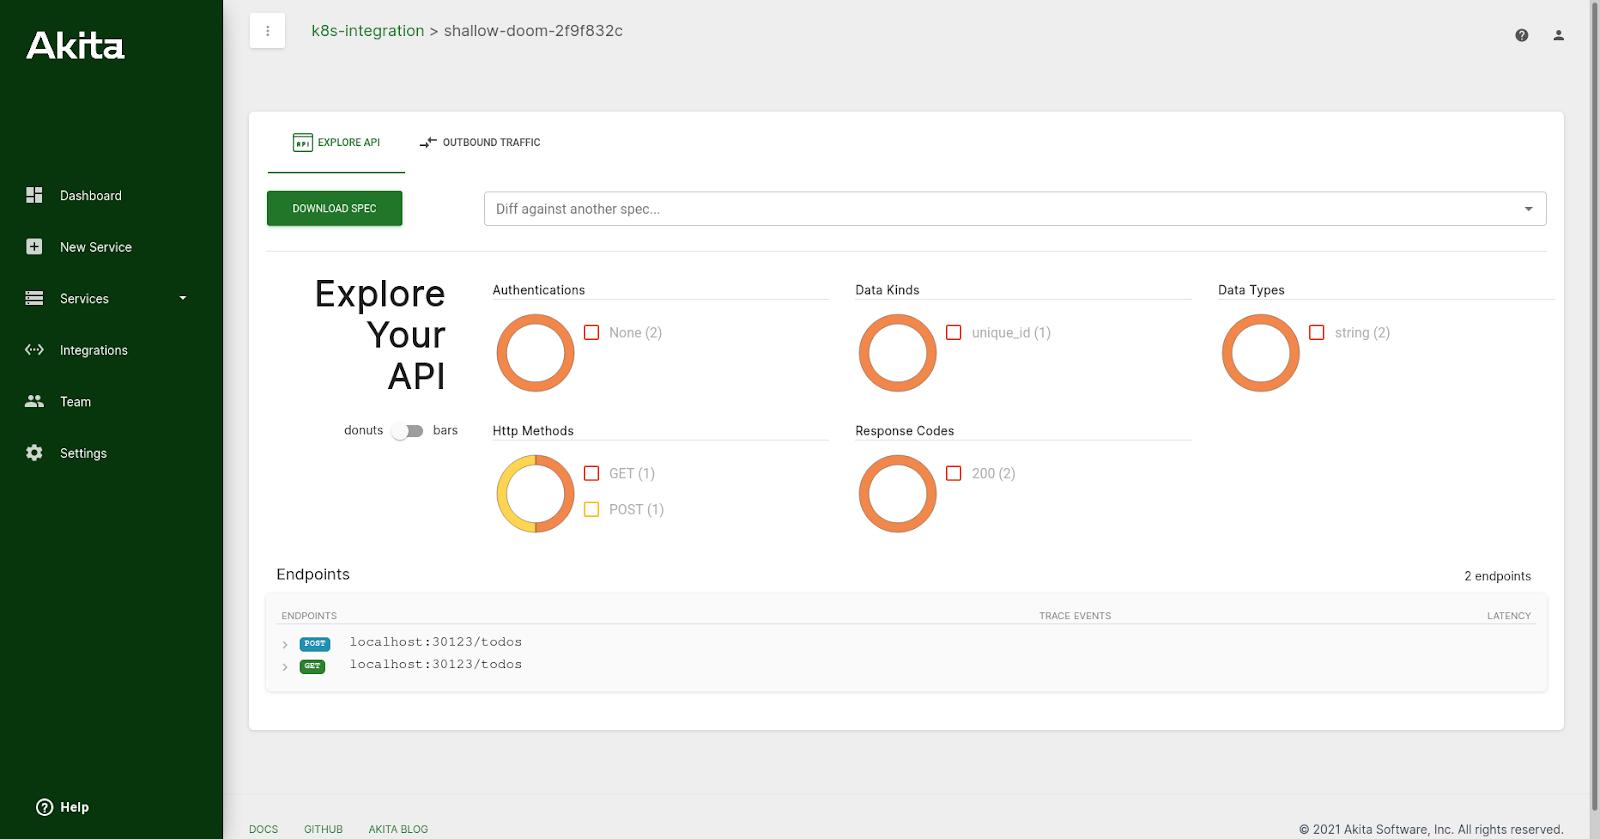 Akita API model visualization